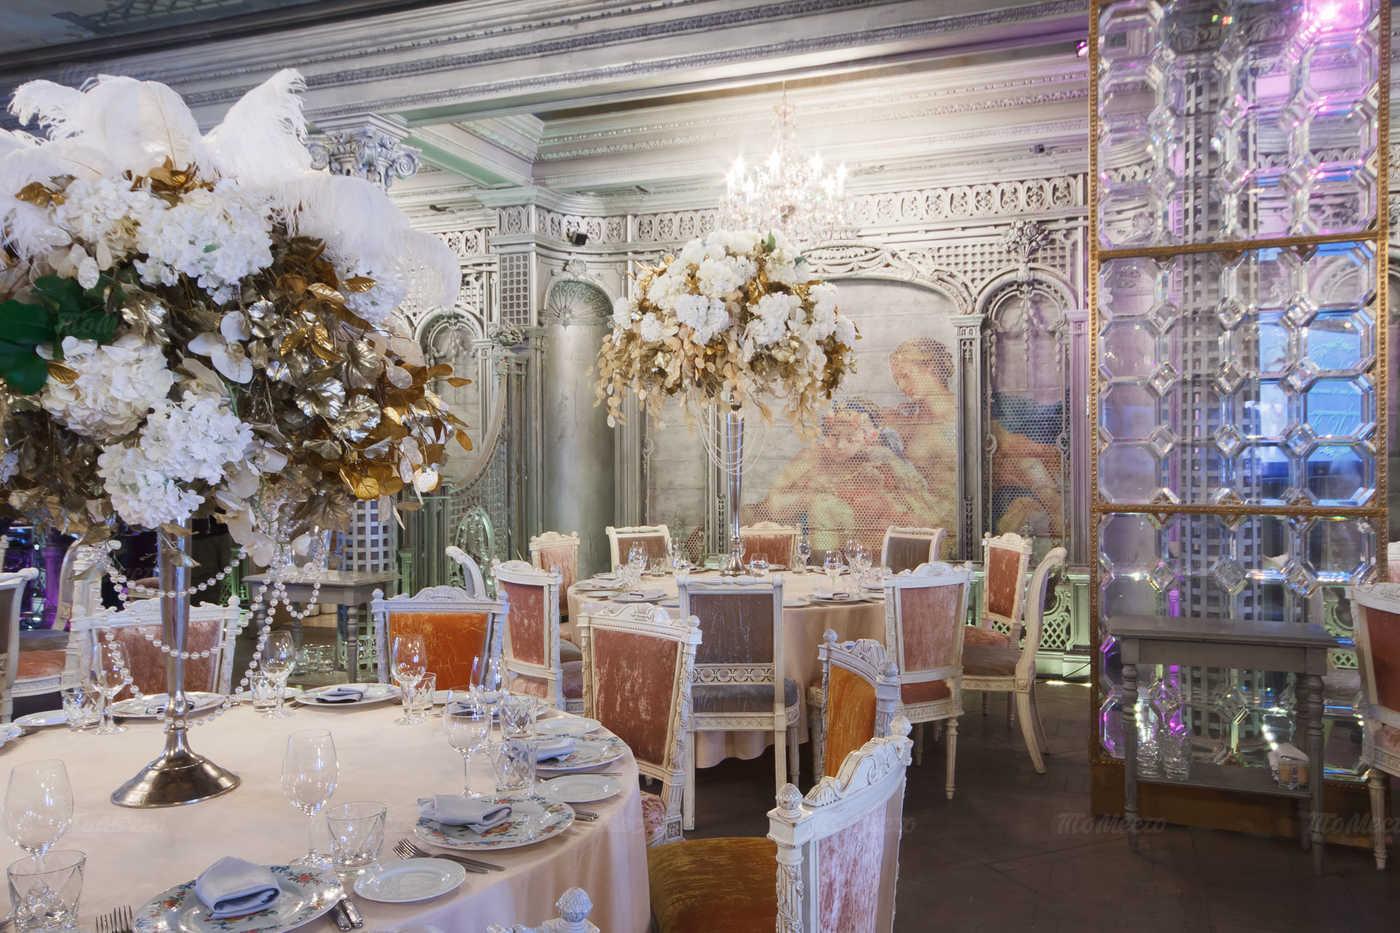 Меню ресторана Турандот на Тверском бульваре